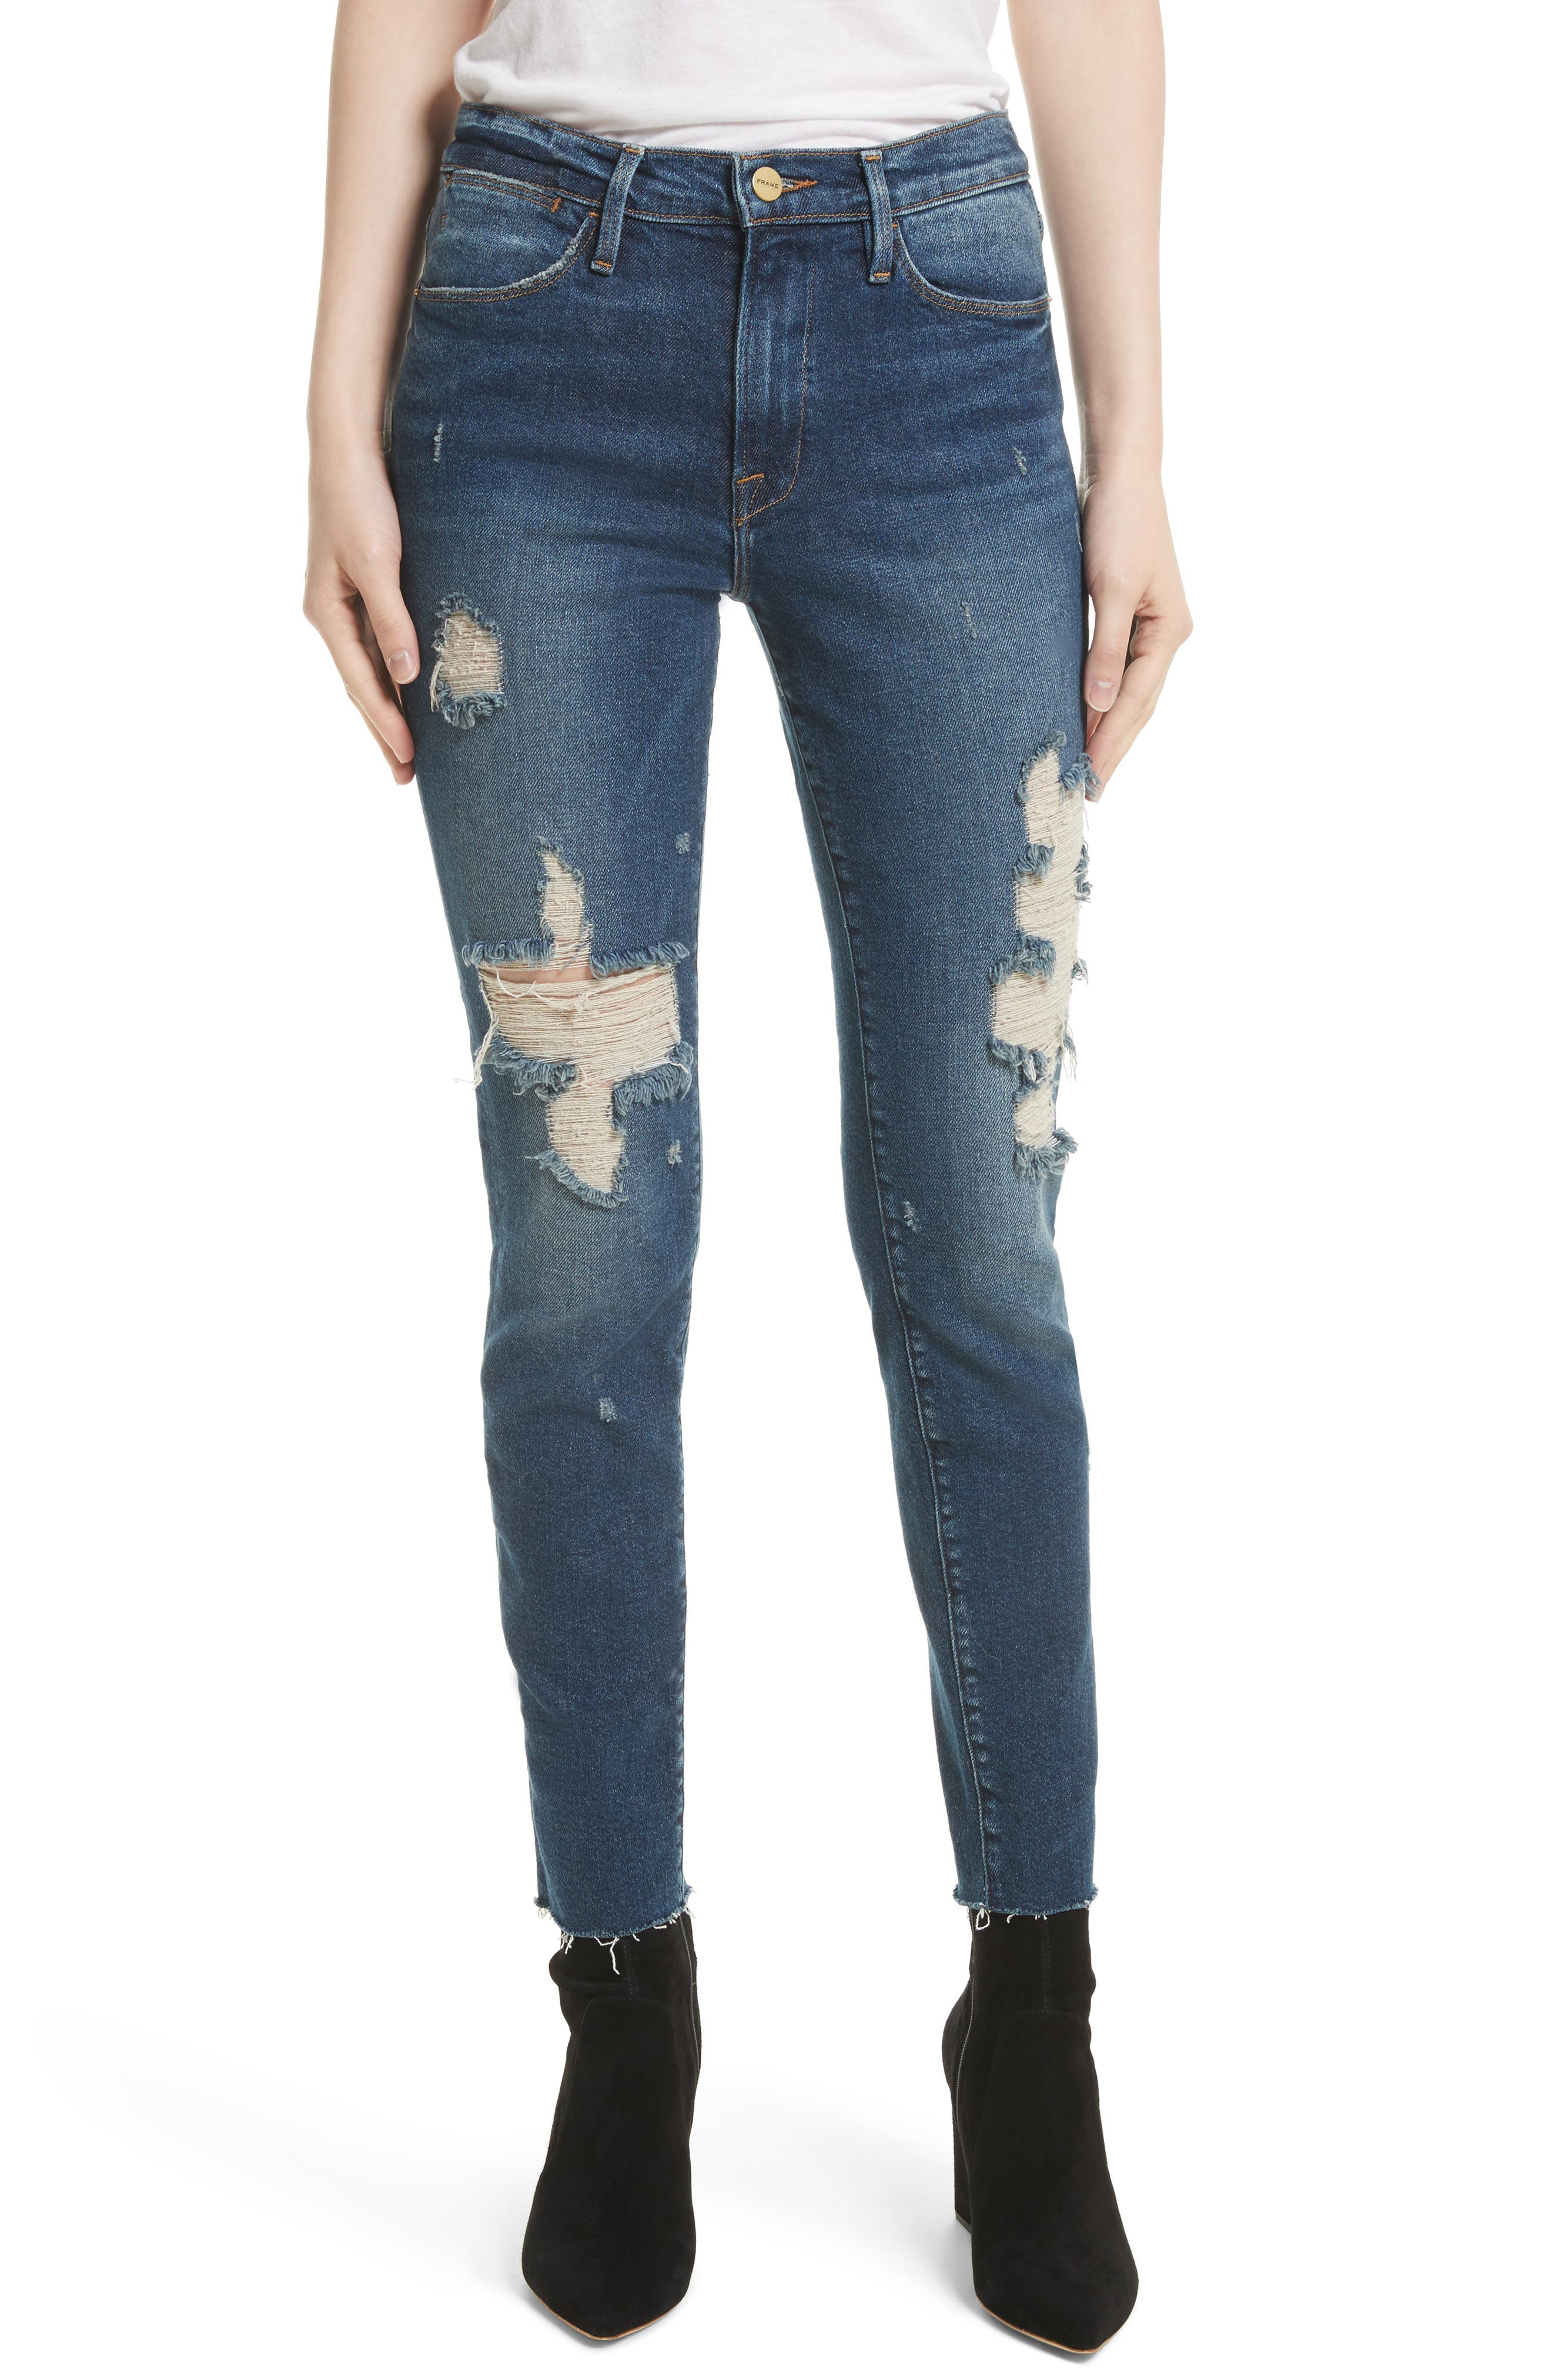 Main Image - FRAME Le High Raw Edge Skinny Jeans (Enford)